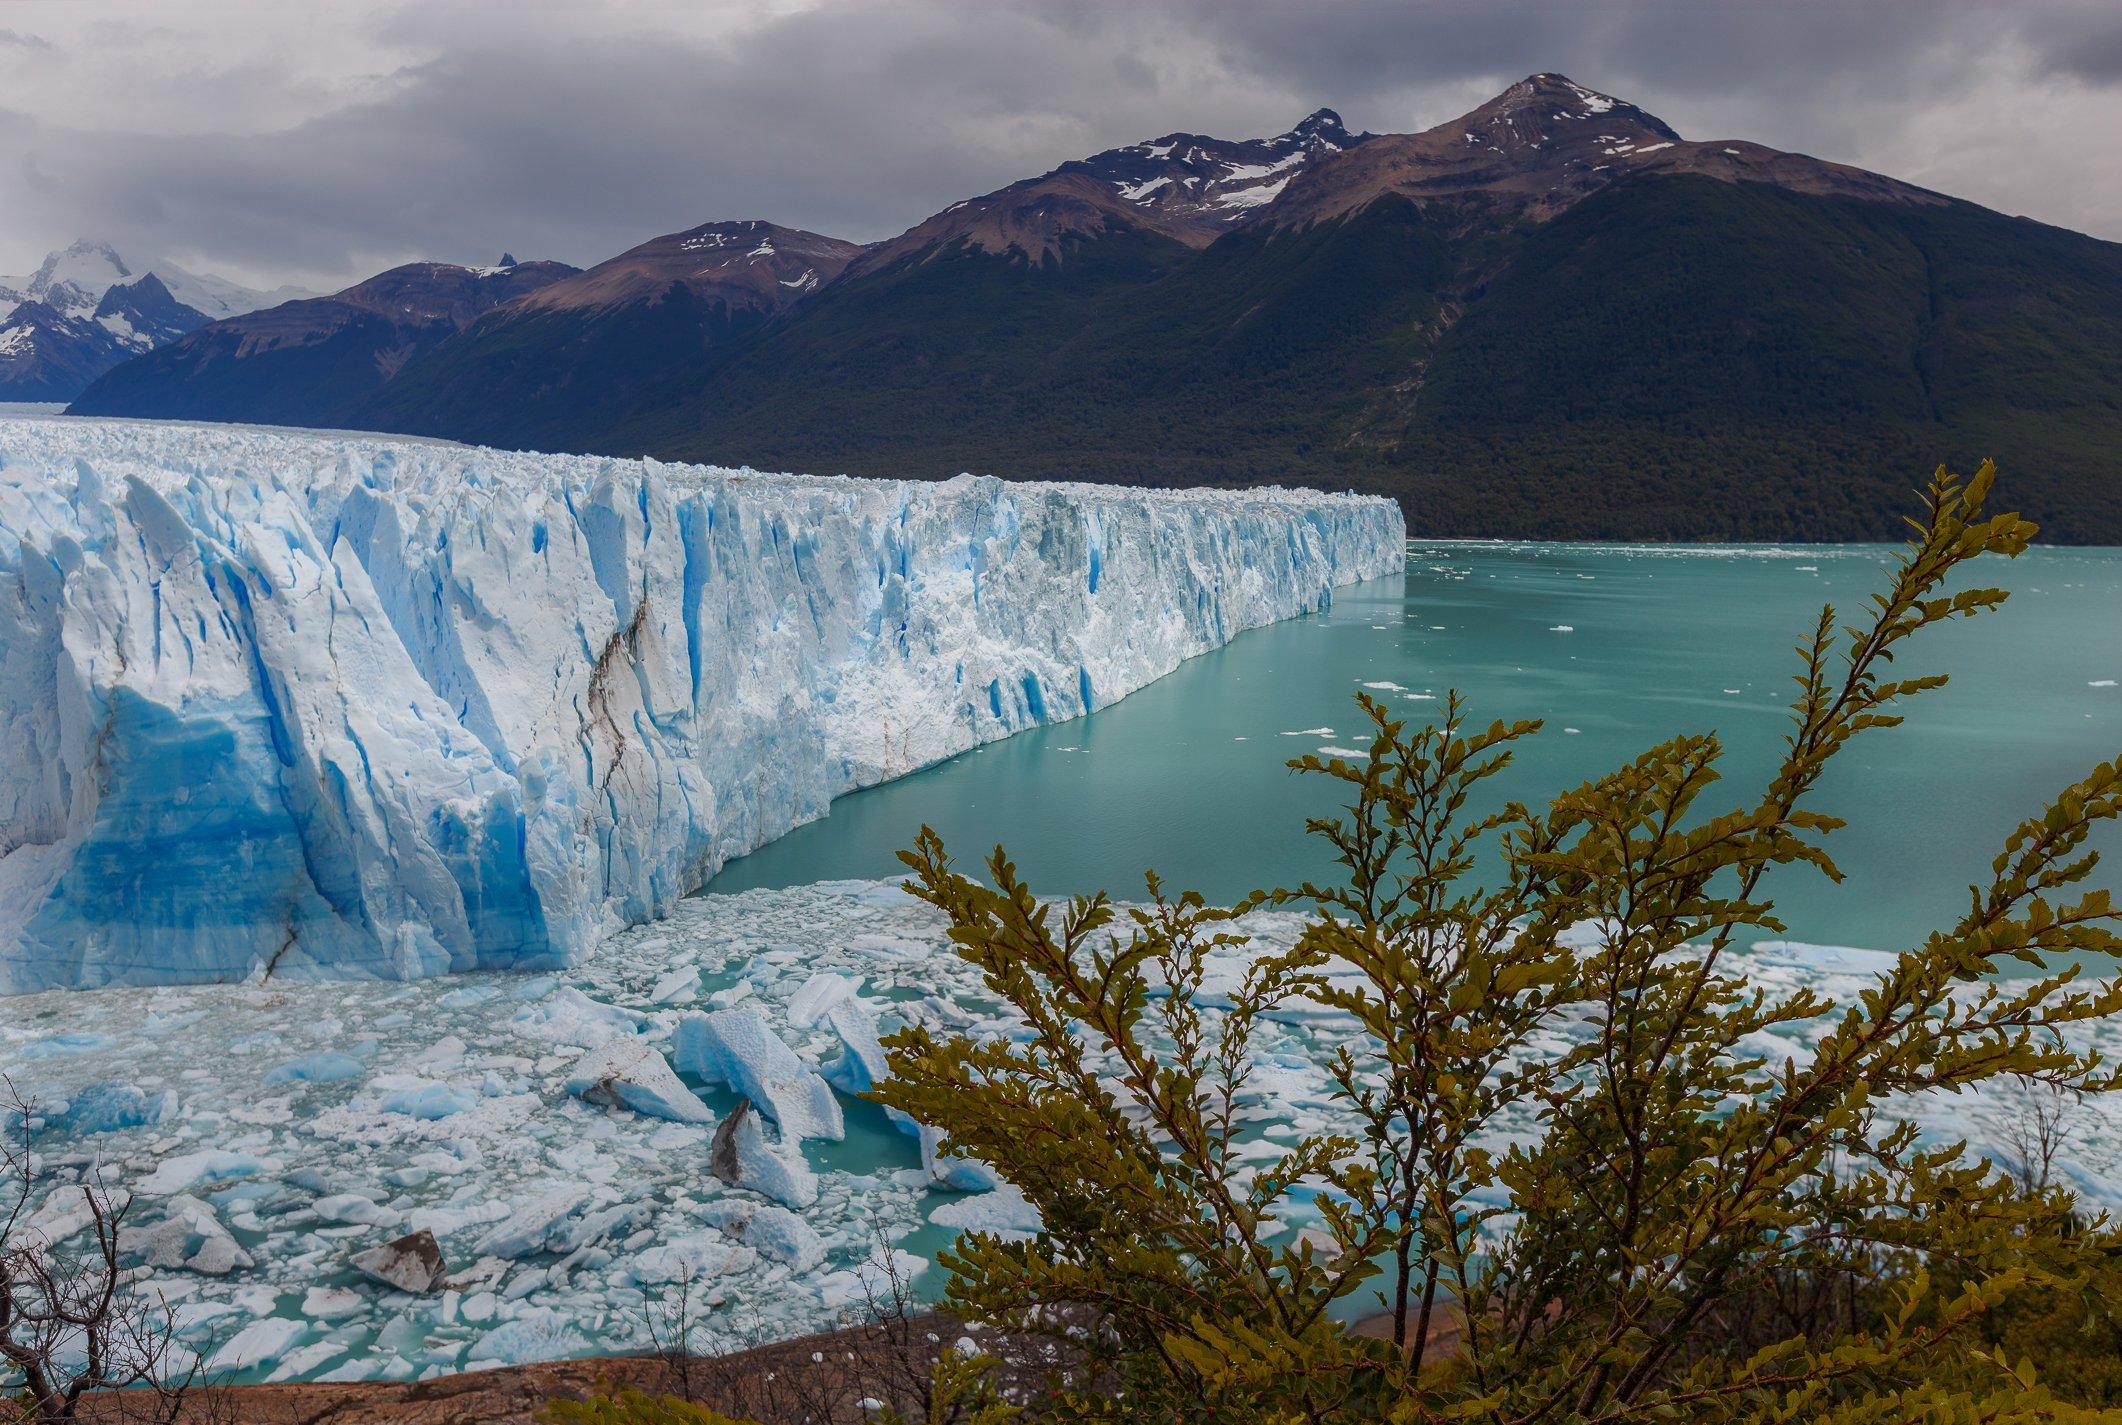 патагония, пейзаж, ледник, перито морено, аргентина, природа, фототур, Дмитрий Илышев (ilyshev.photo)